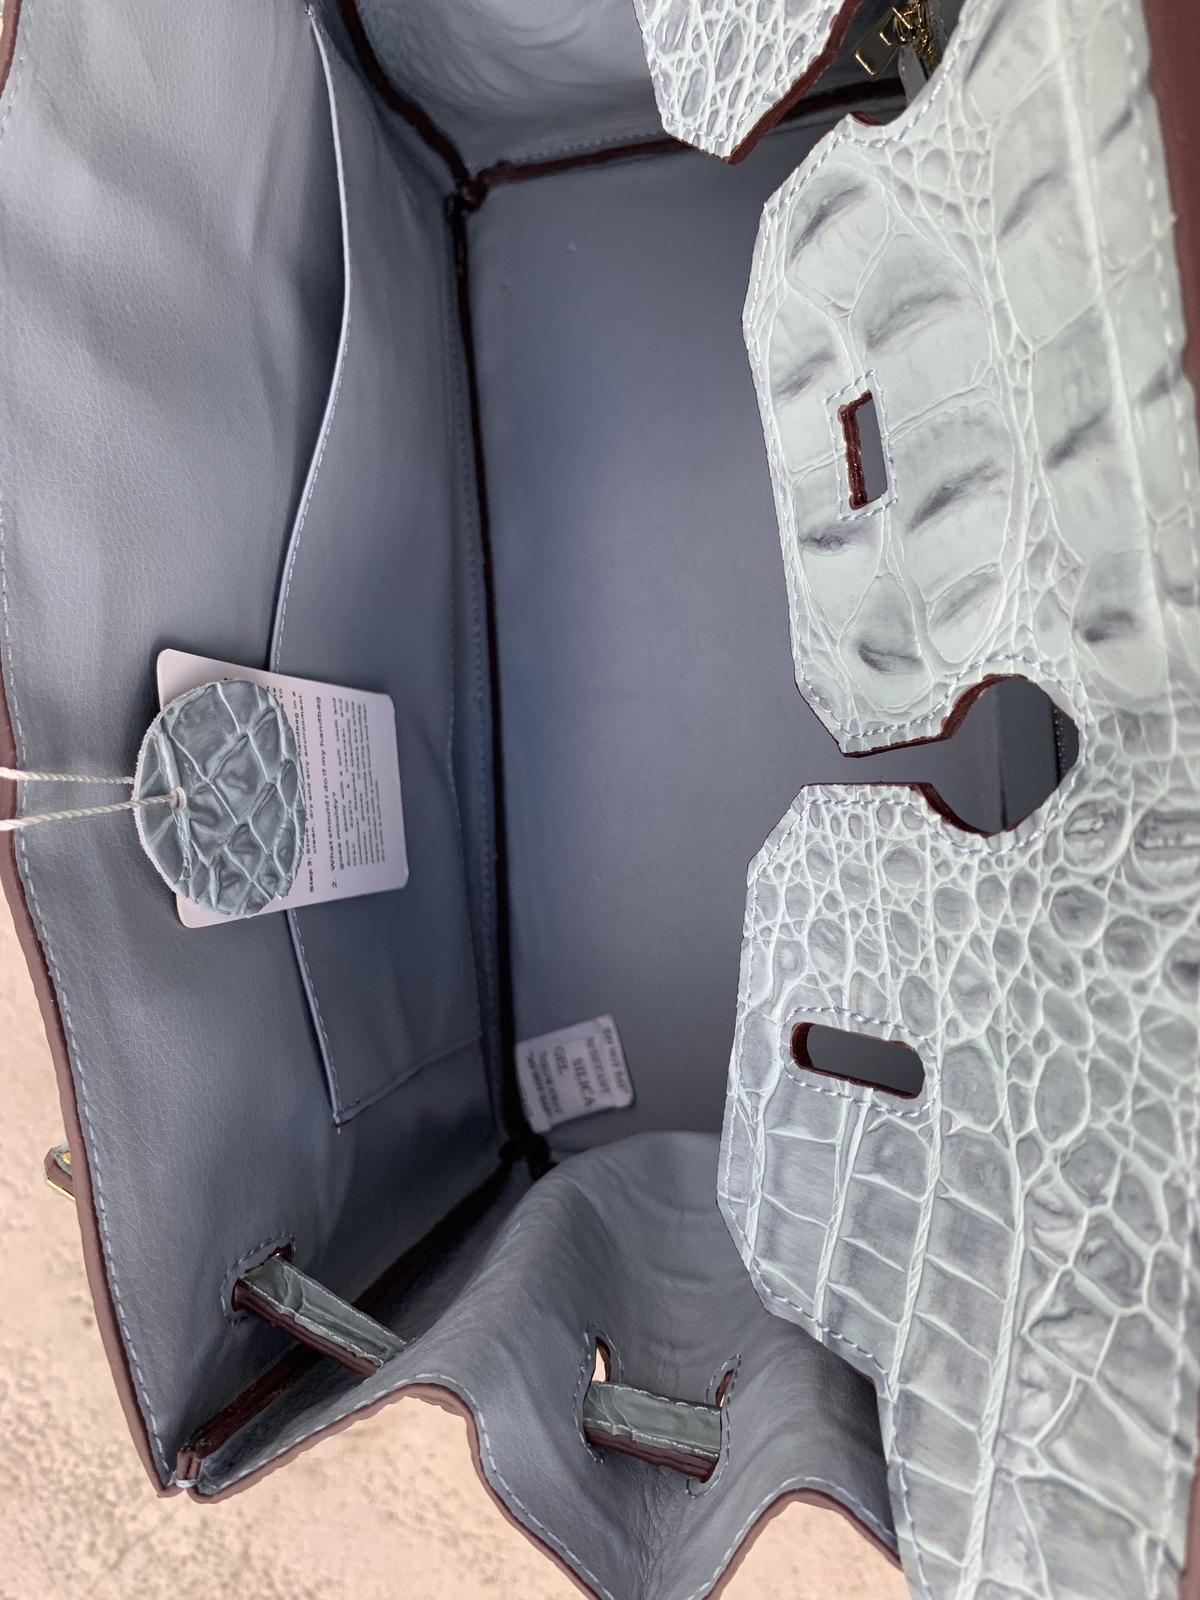 35cm Blue Crocodile Embossed Print Italian Leather Birkin Type Satchel Handbag